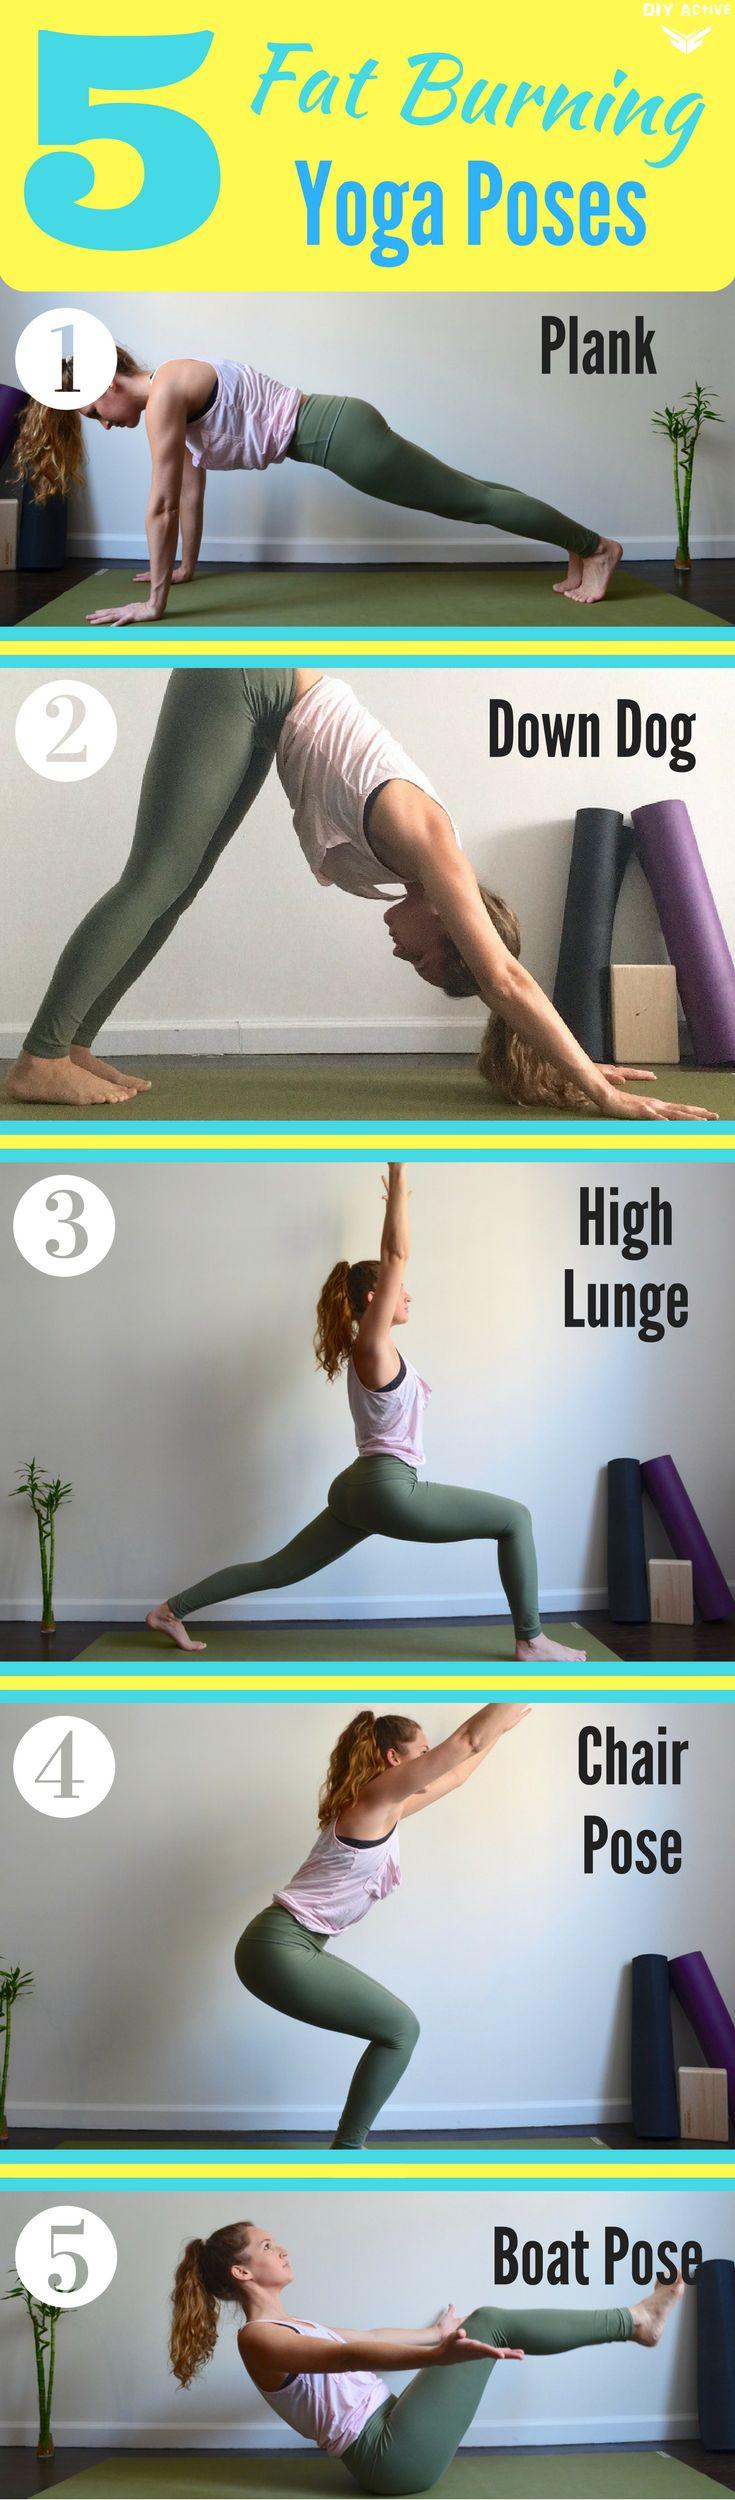 5 Fat Burning Yoga Poses You Have to Try via @DIYActiveHQ